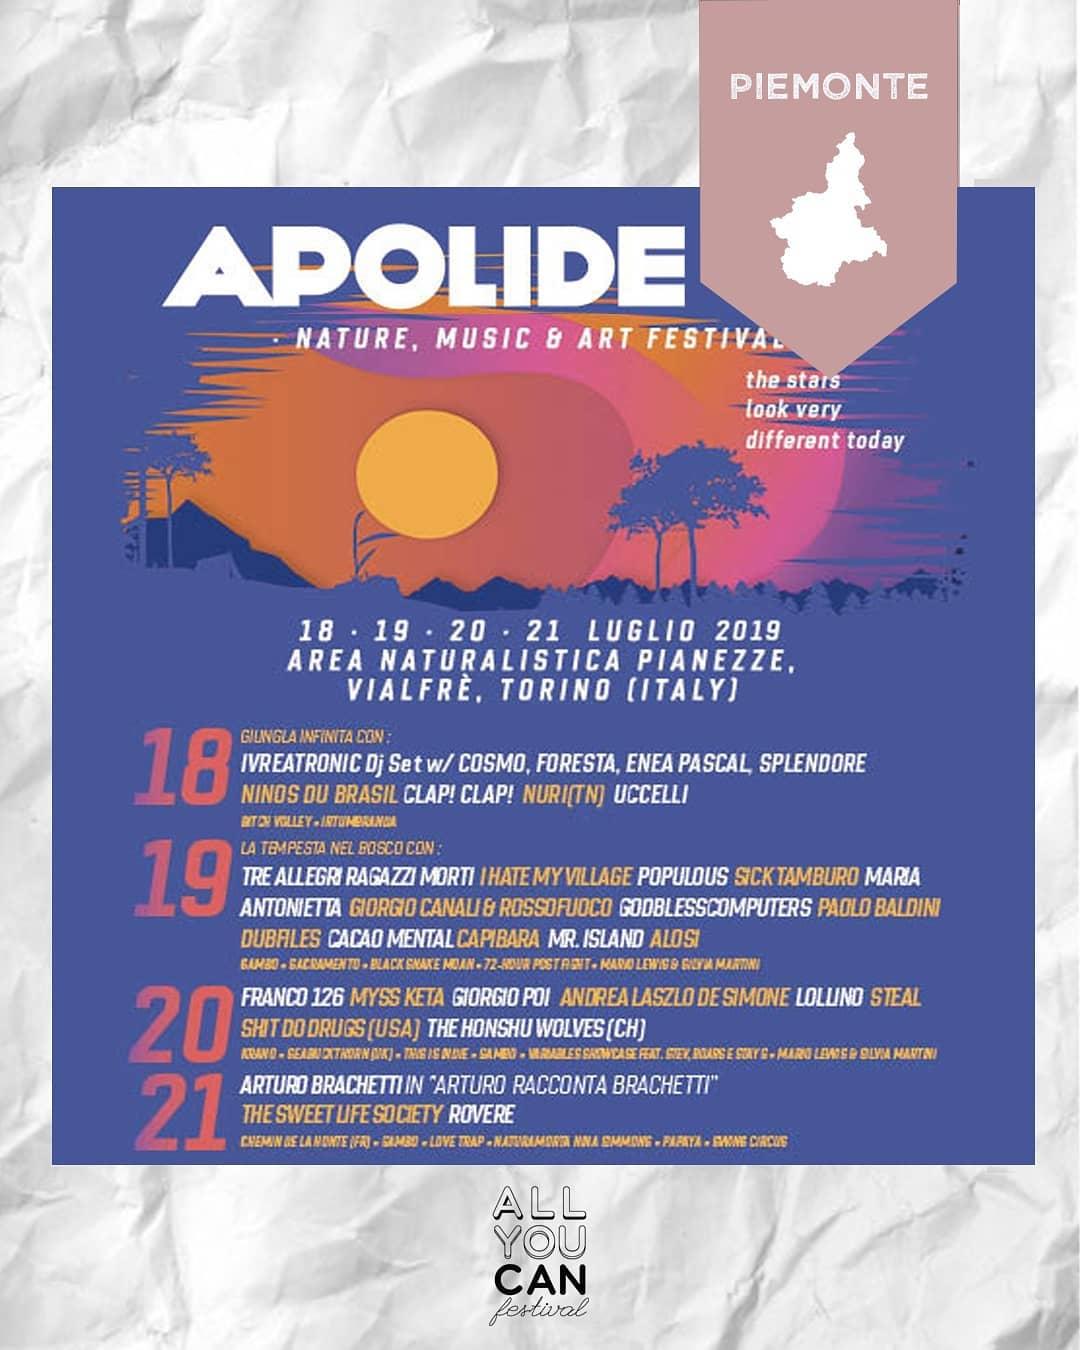 Apolide Festival @ Vialfrè